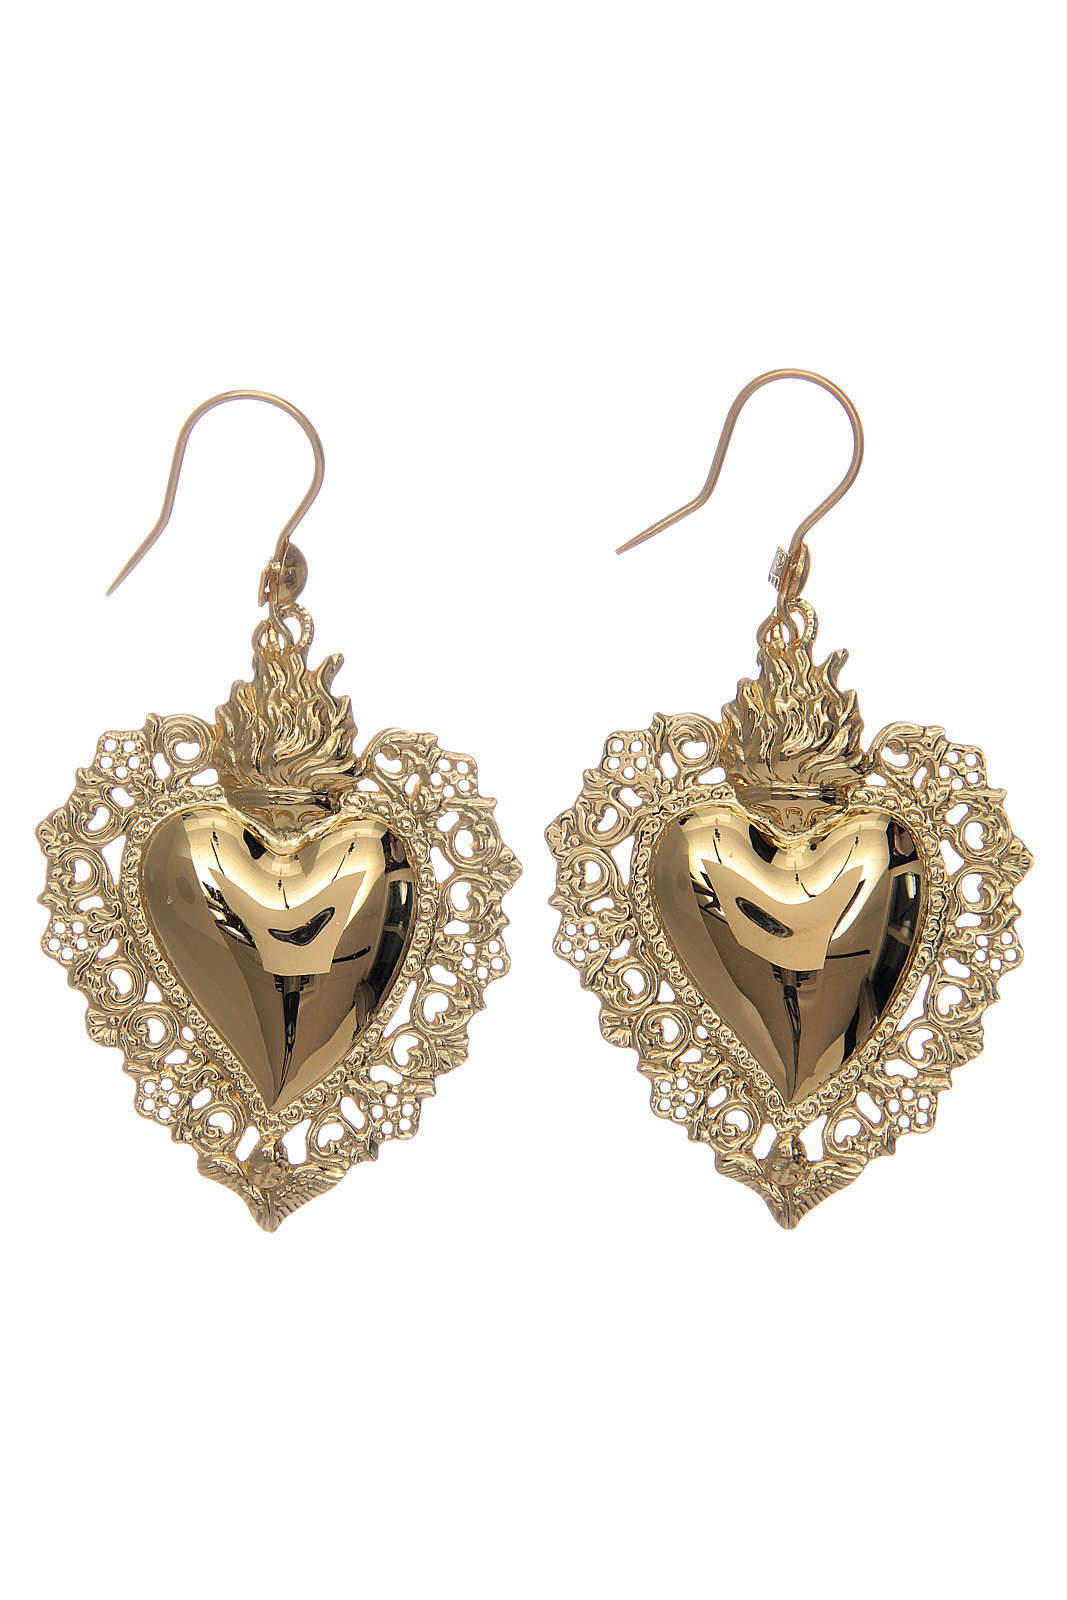 Pendientes corazón votivo perforado plata 925 dorada 4 x 3 cm 4